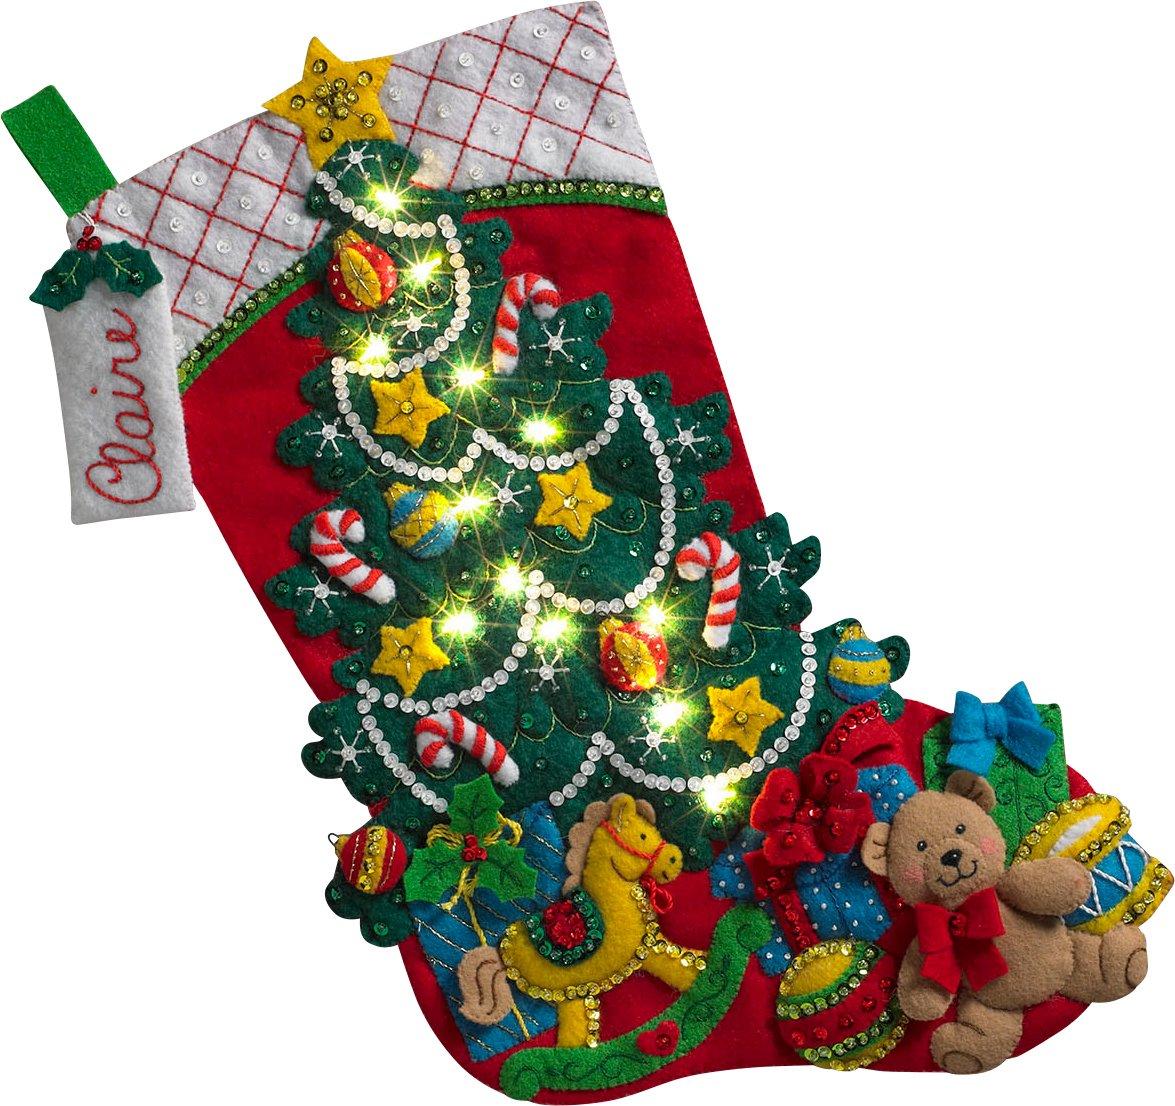 BUCILLA 86710 Christmas Tree Surprise Stocking Kit by Bucilla